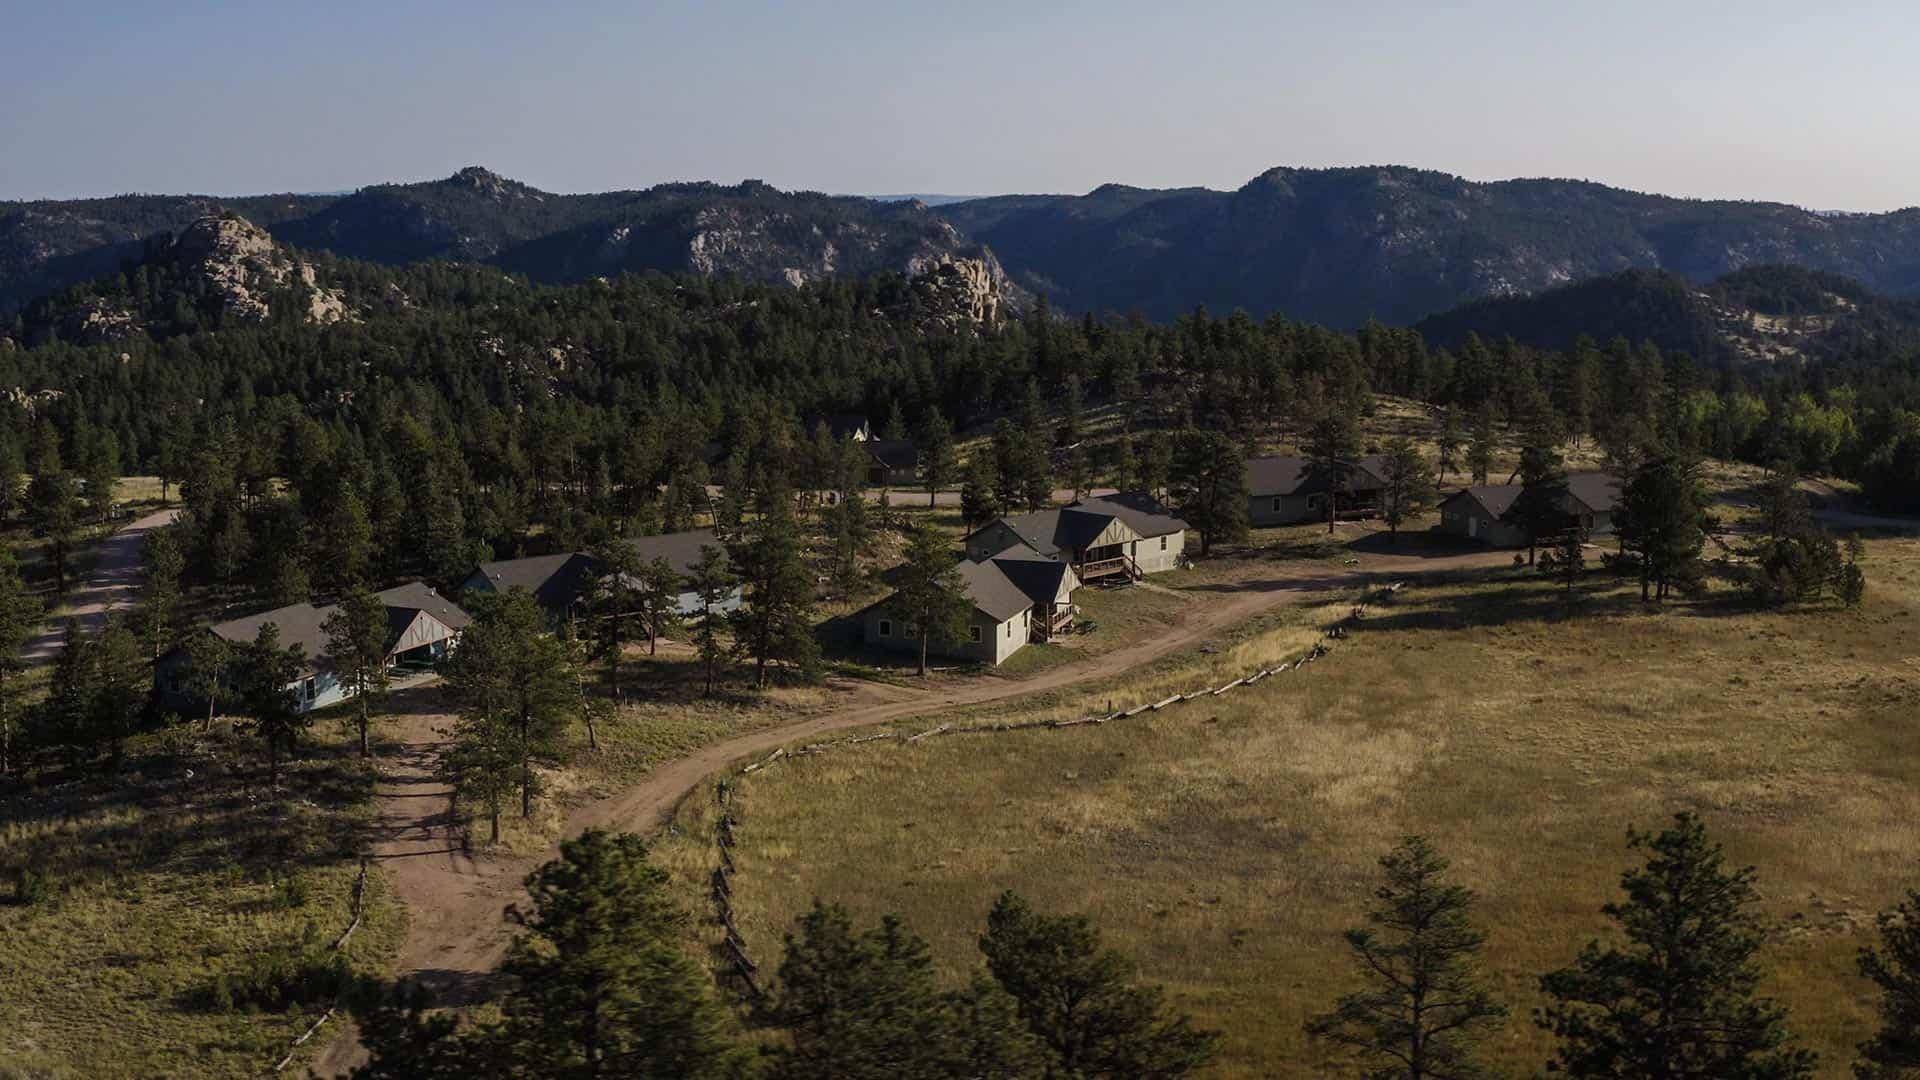 Mirr Ranch Group Photo